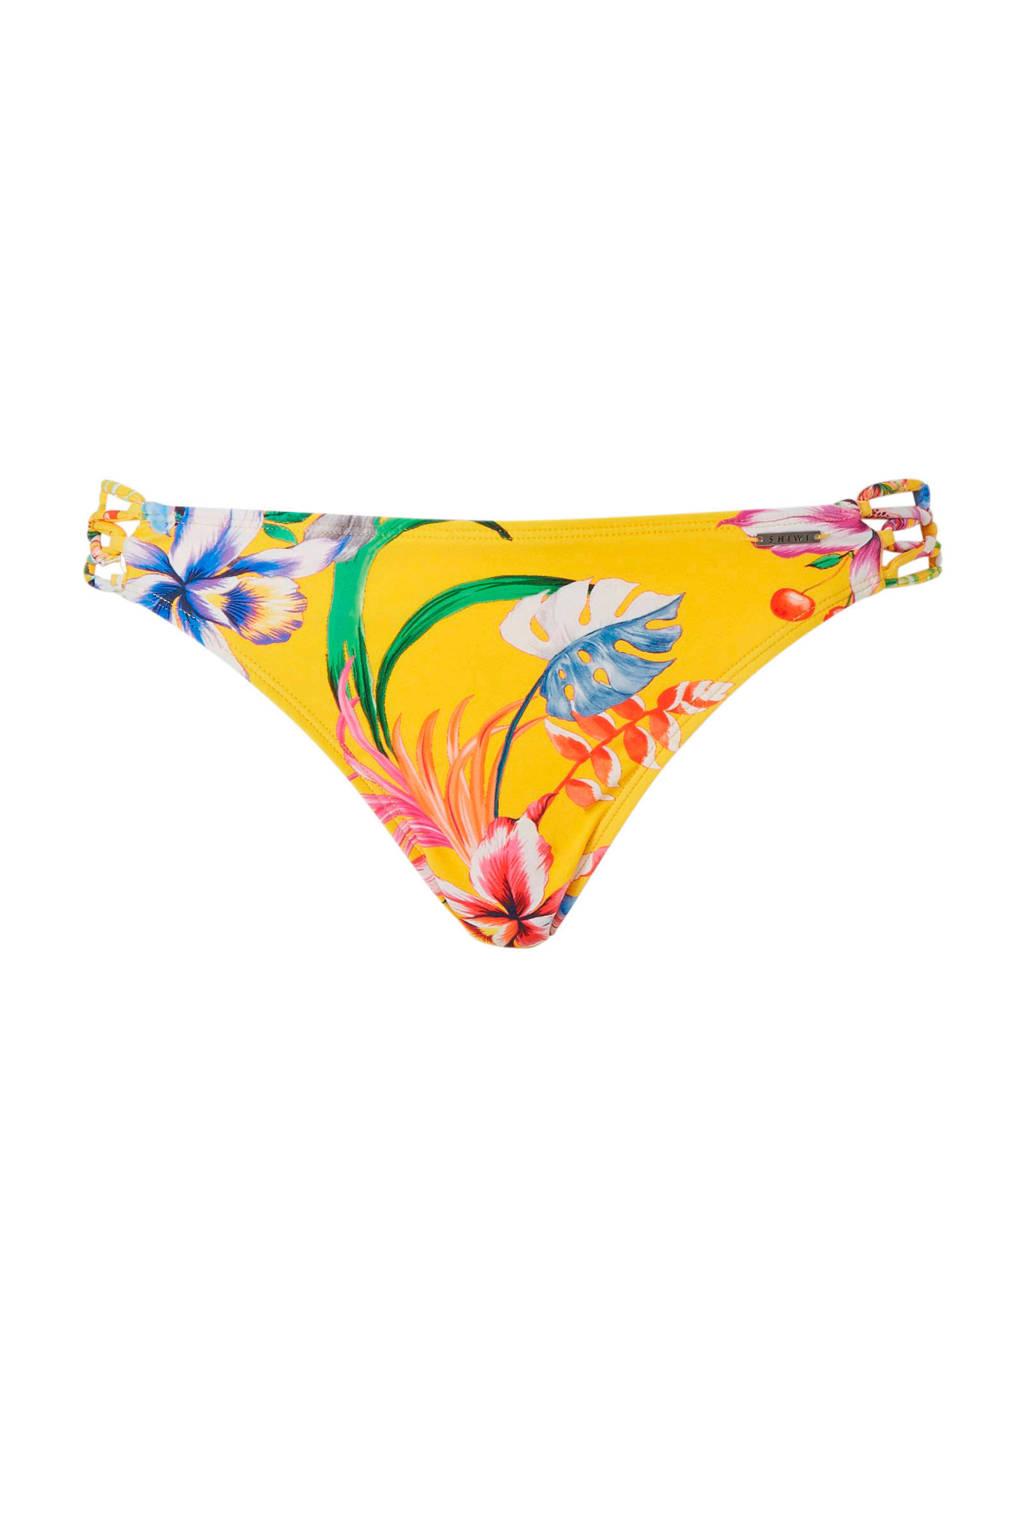 Shiwi bikinibroekje met bloemen print geel, Geel/roze/groen